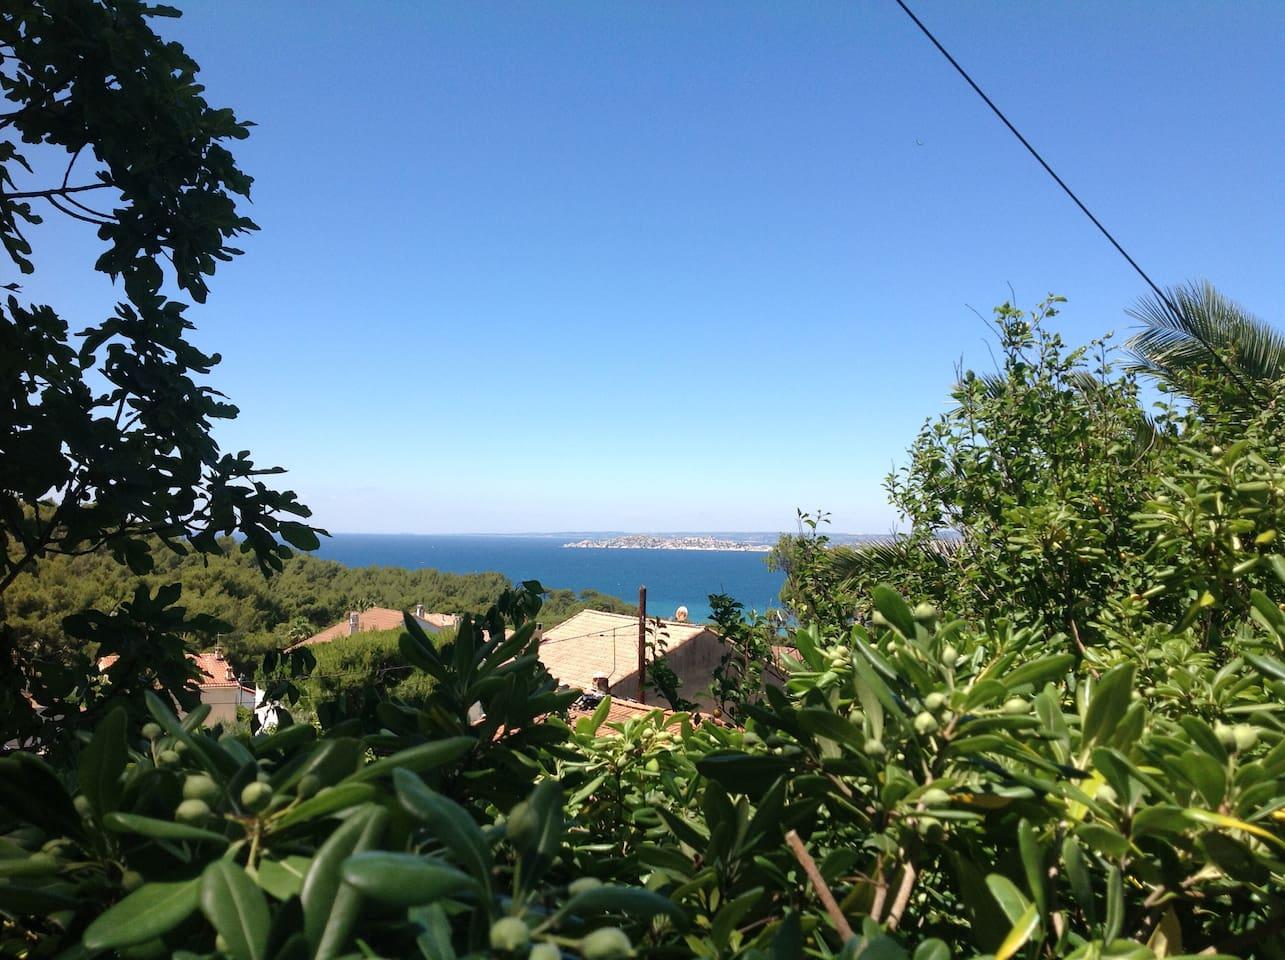 Sur la colline de Marseilleveyre, face à la rade de Marseille